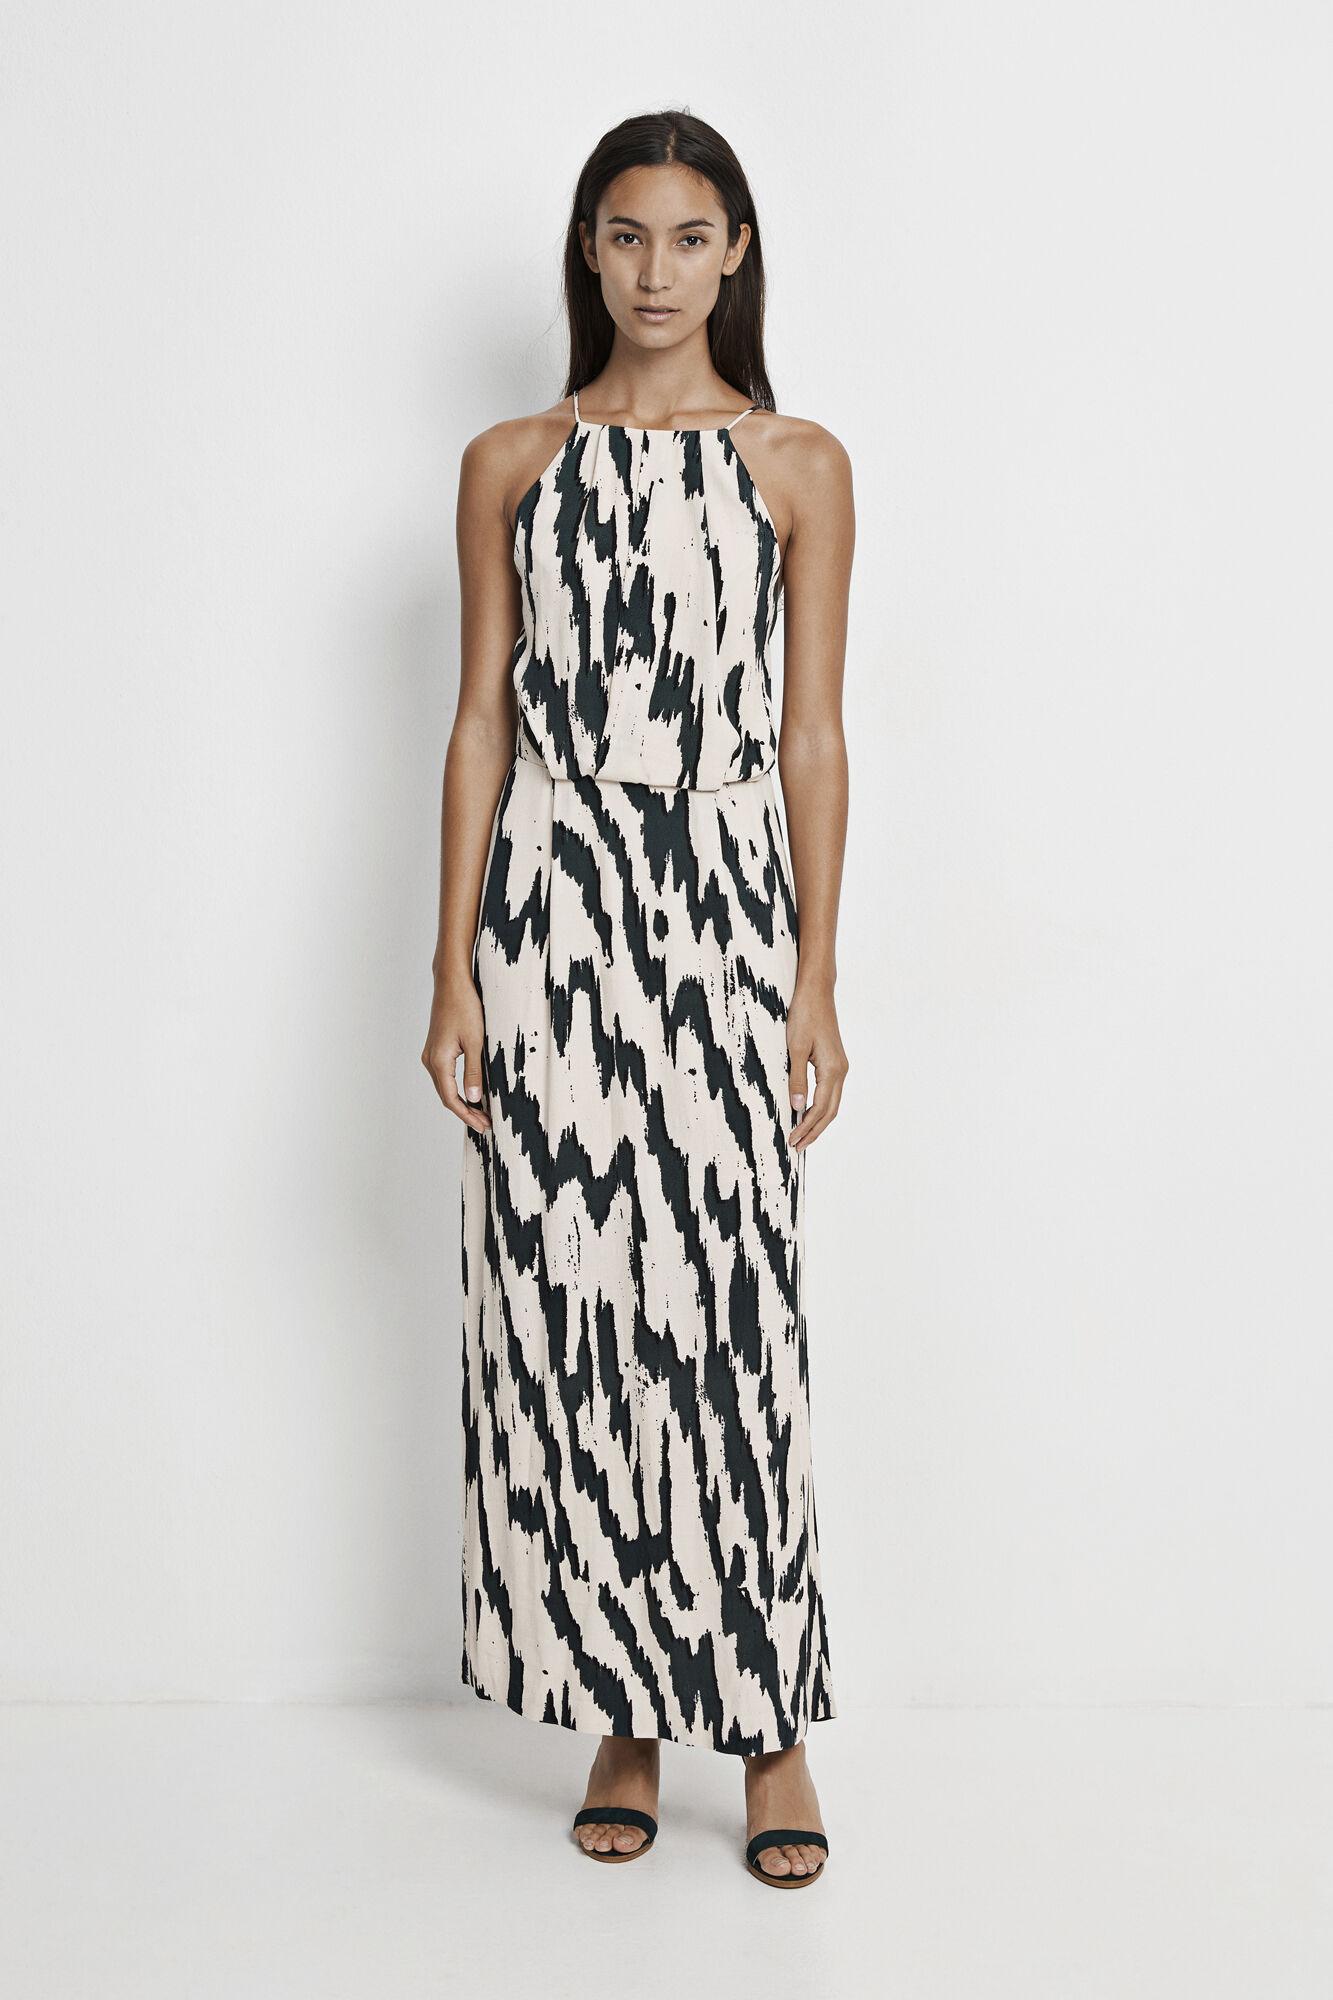 Willow dress long aop 5687, EDGE